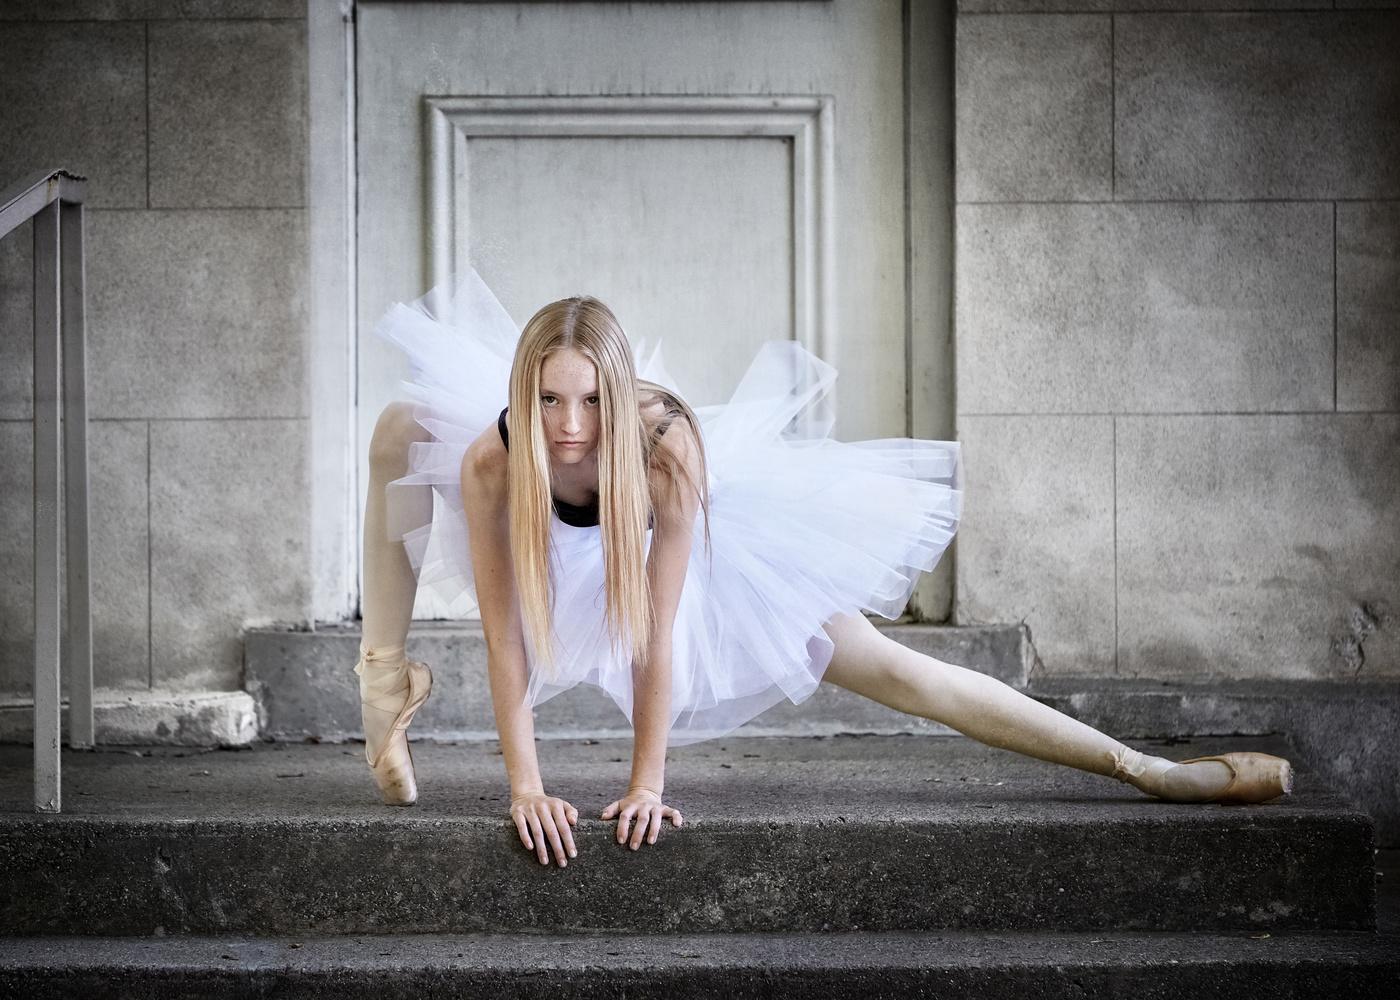 Attitude Dance by Hank Rintjema